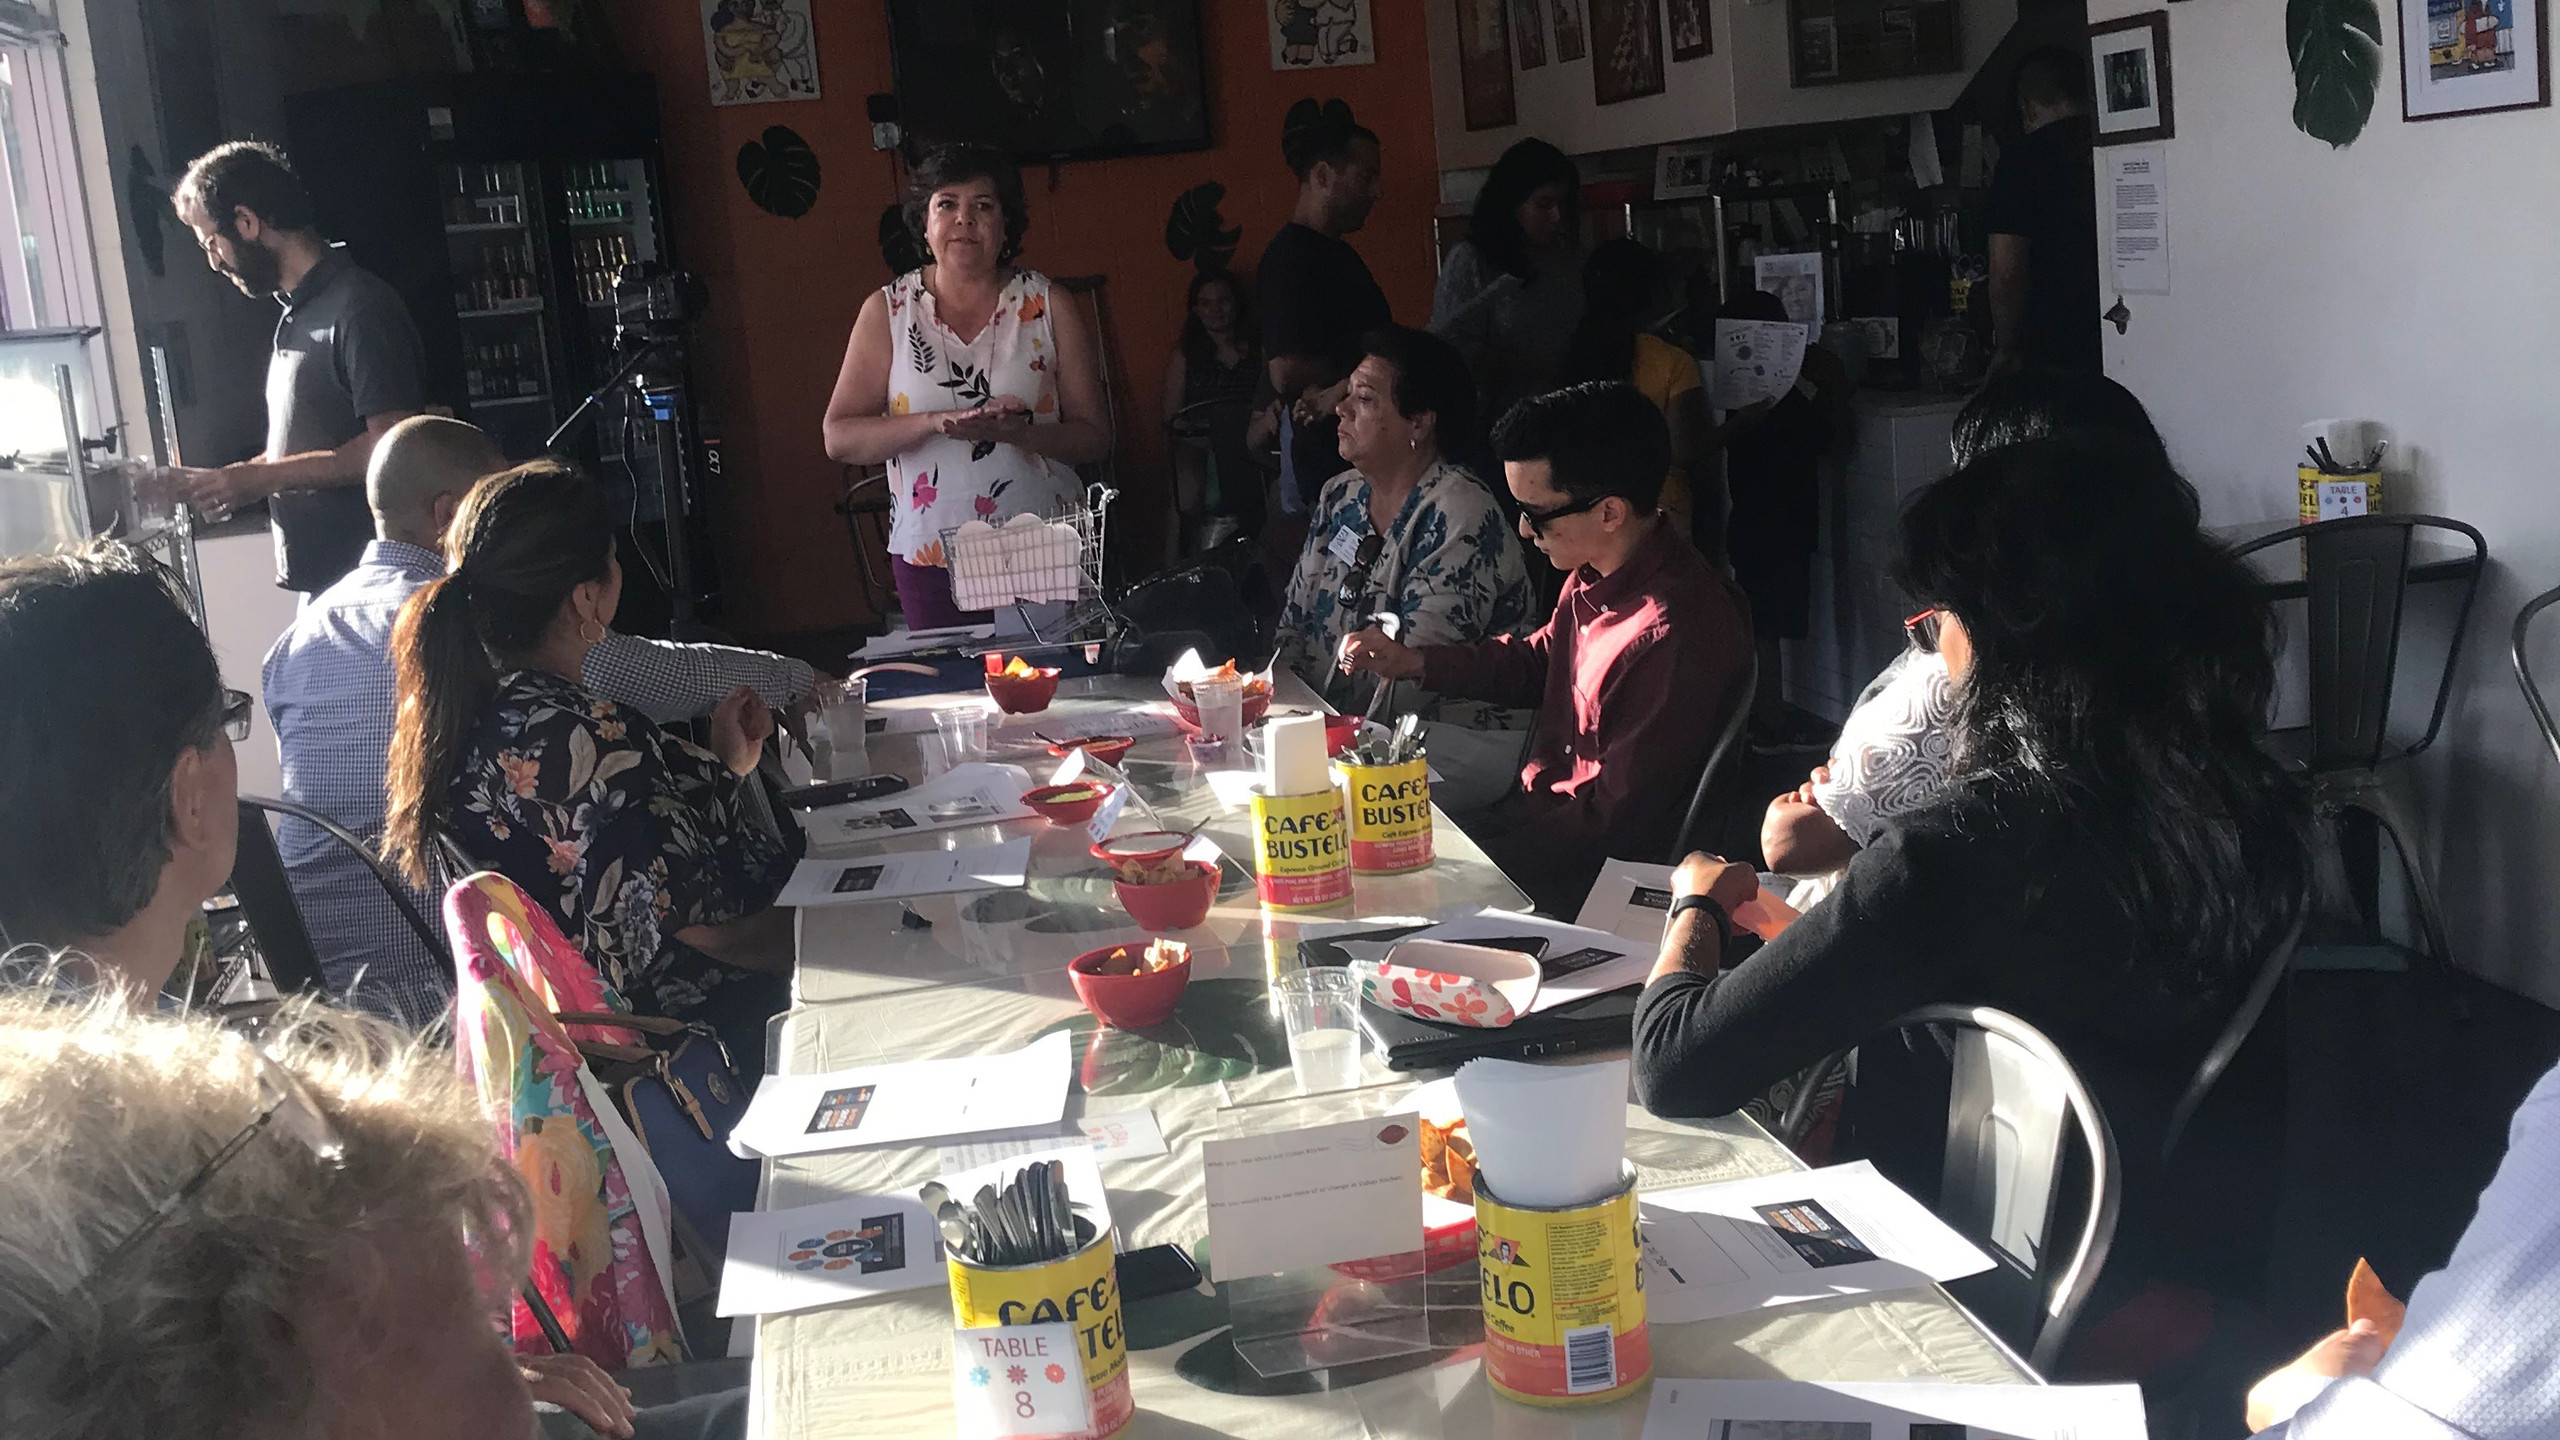 lcc cuban kitchen meeting